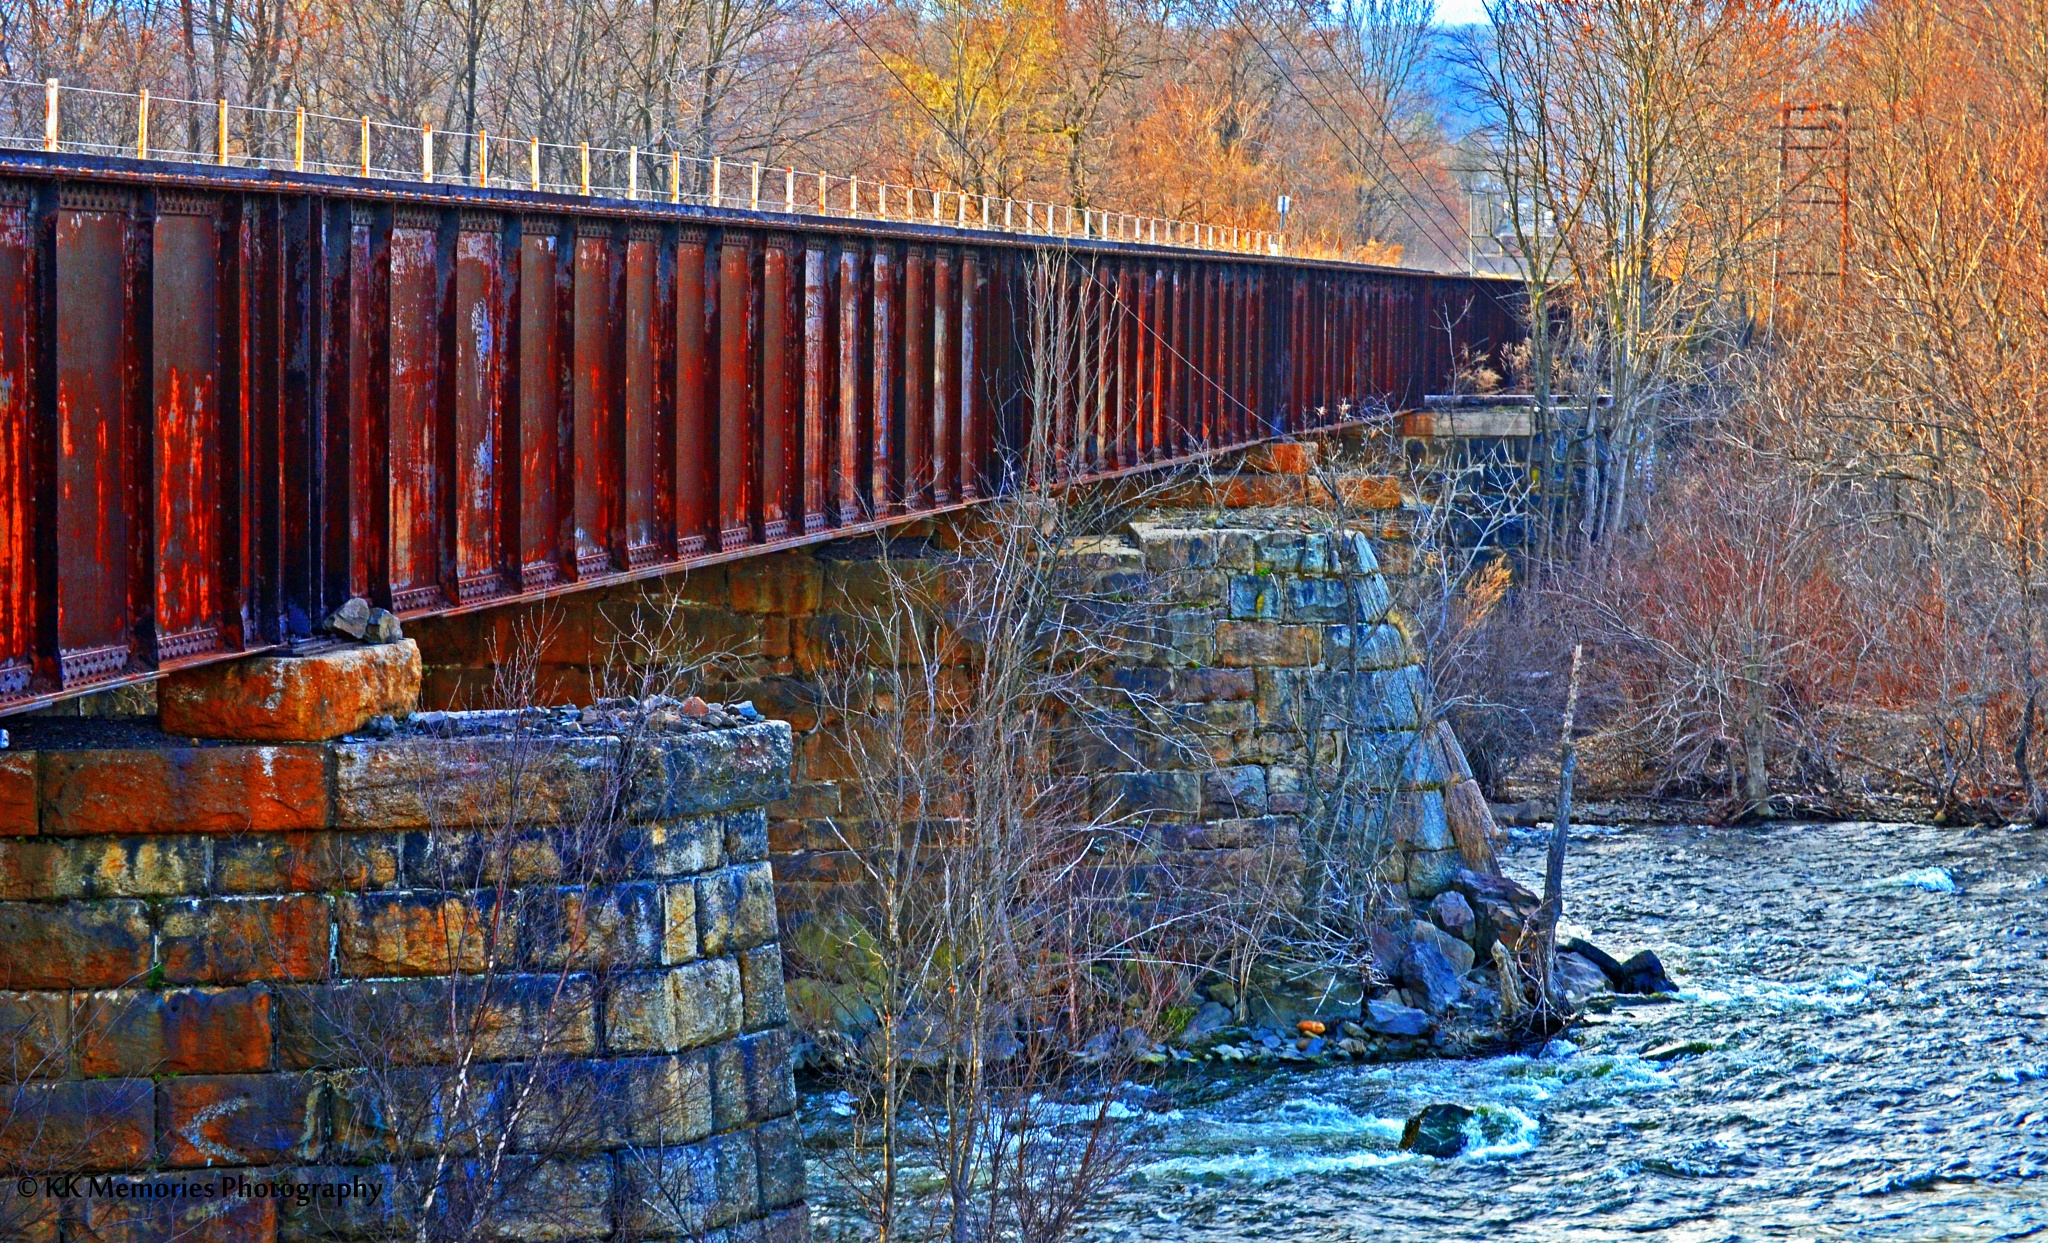 Bridge by kkmemories